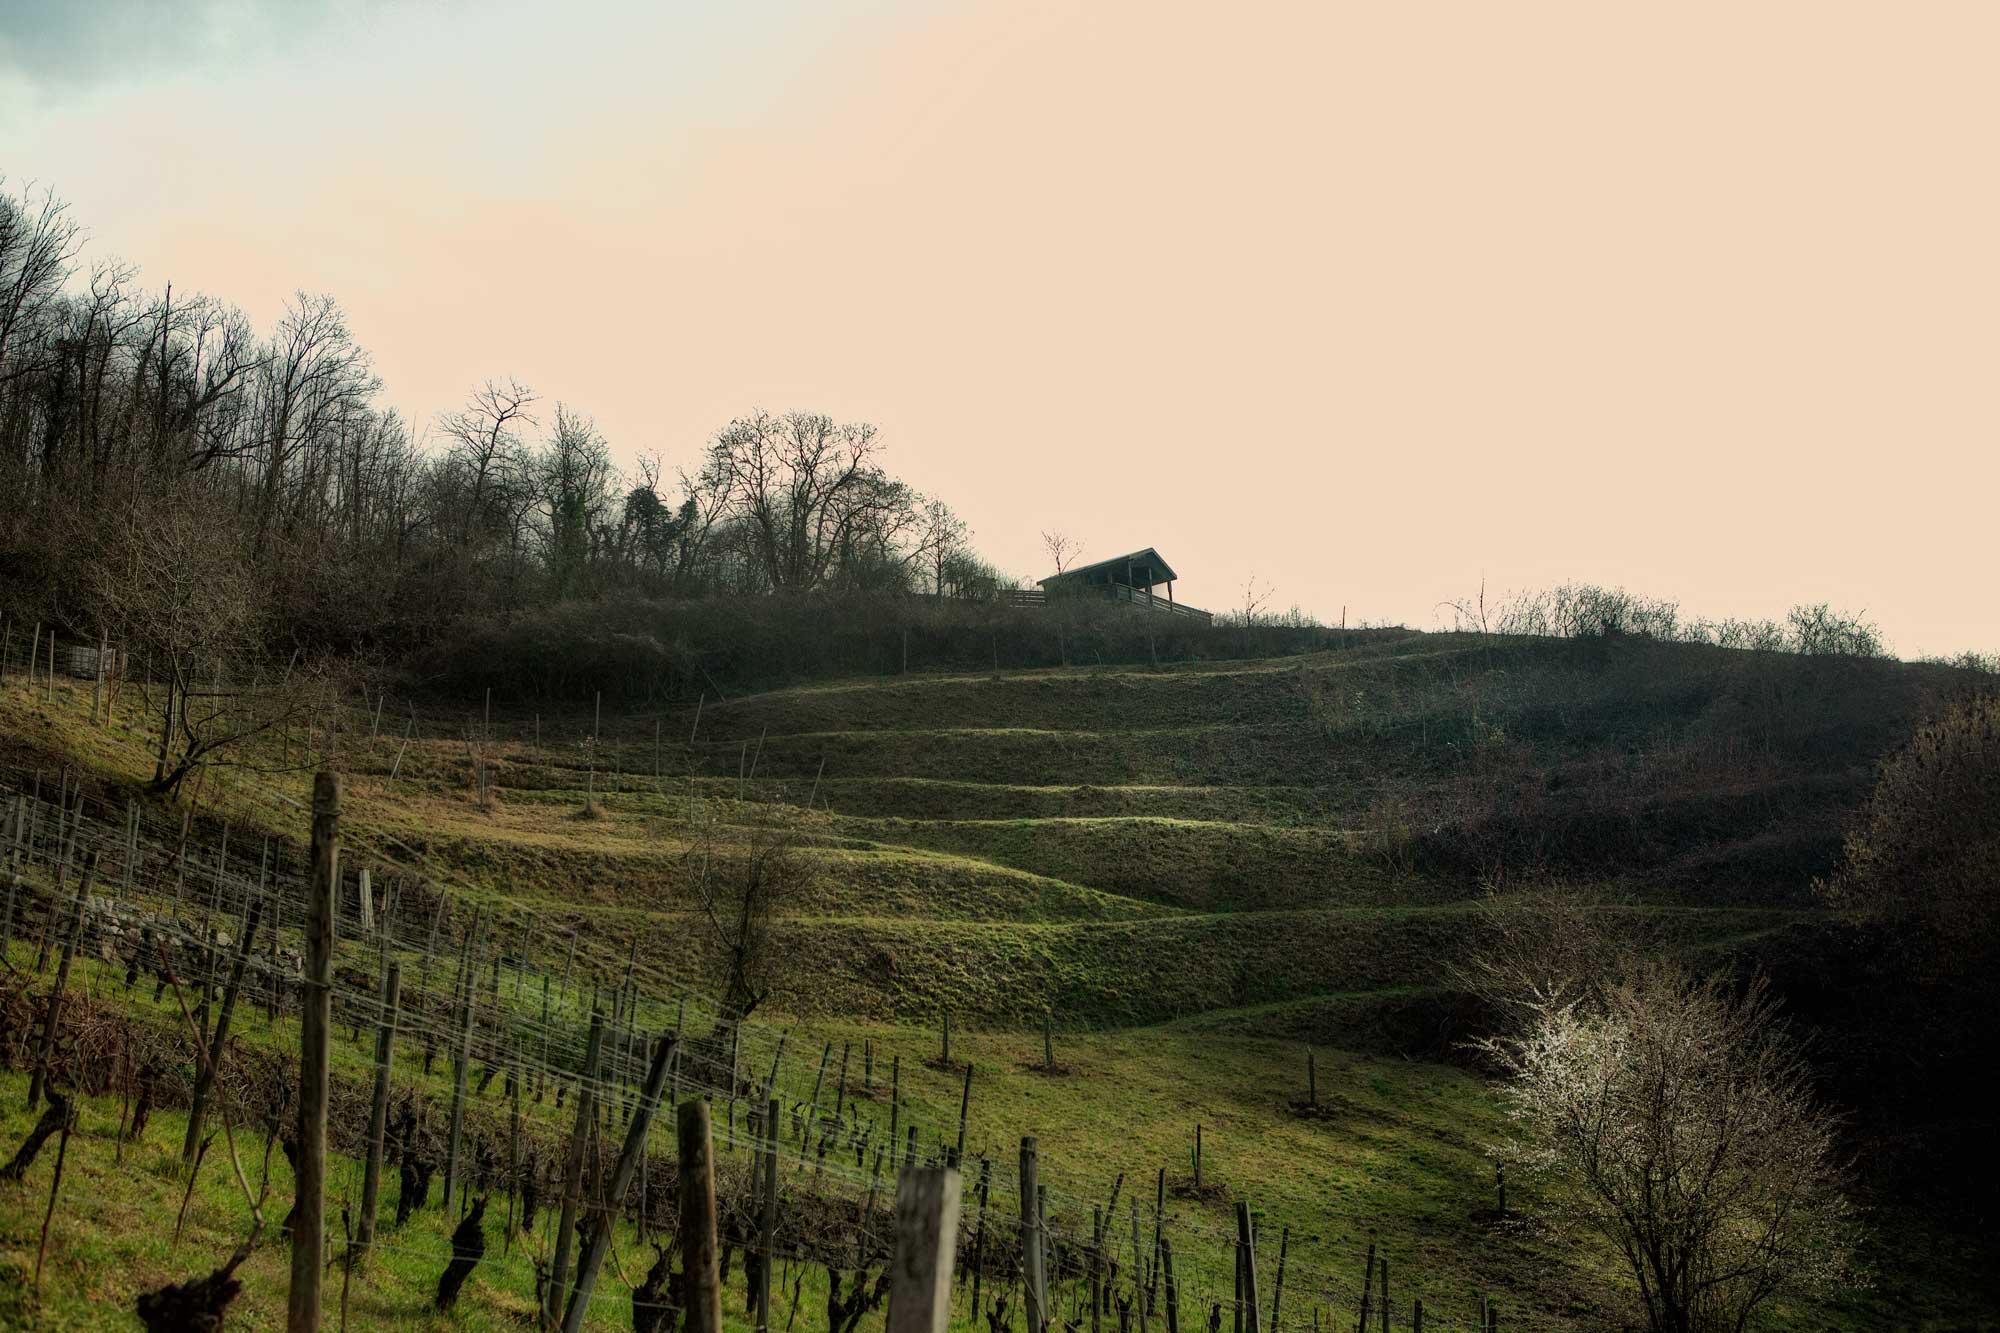 Feligreno, Alte Burg, Zwingenberg